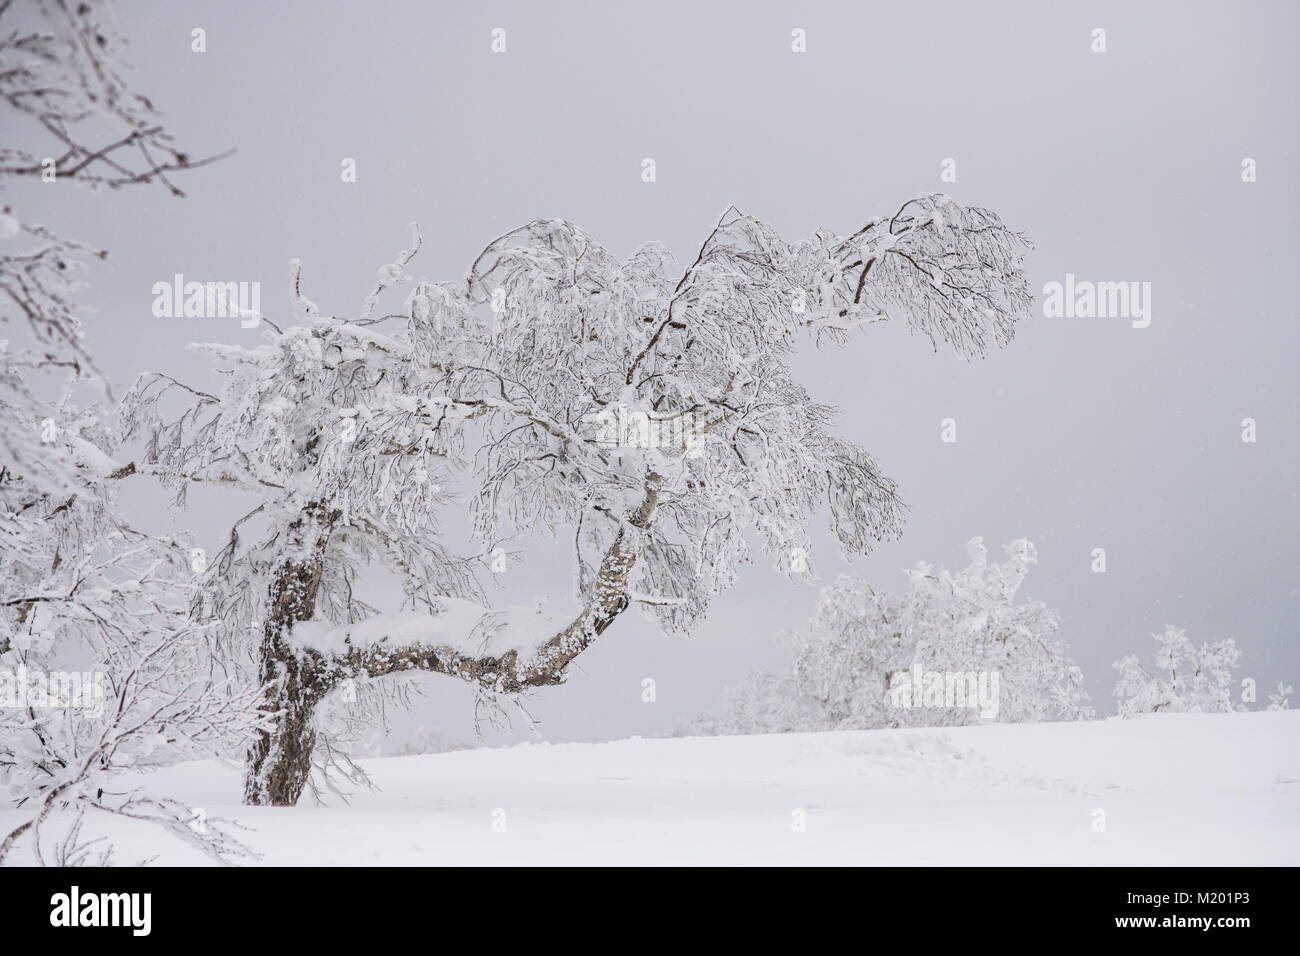 beautiful frozen tree in winter season snow stuck on branch and trunk Stock Photo